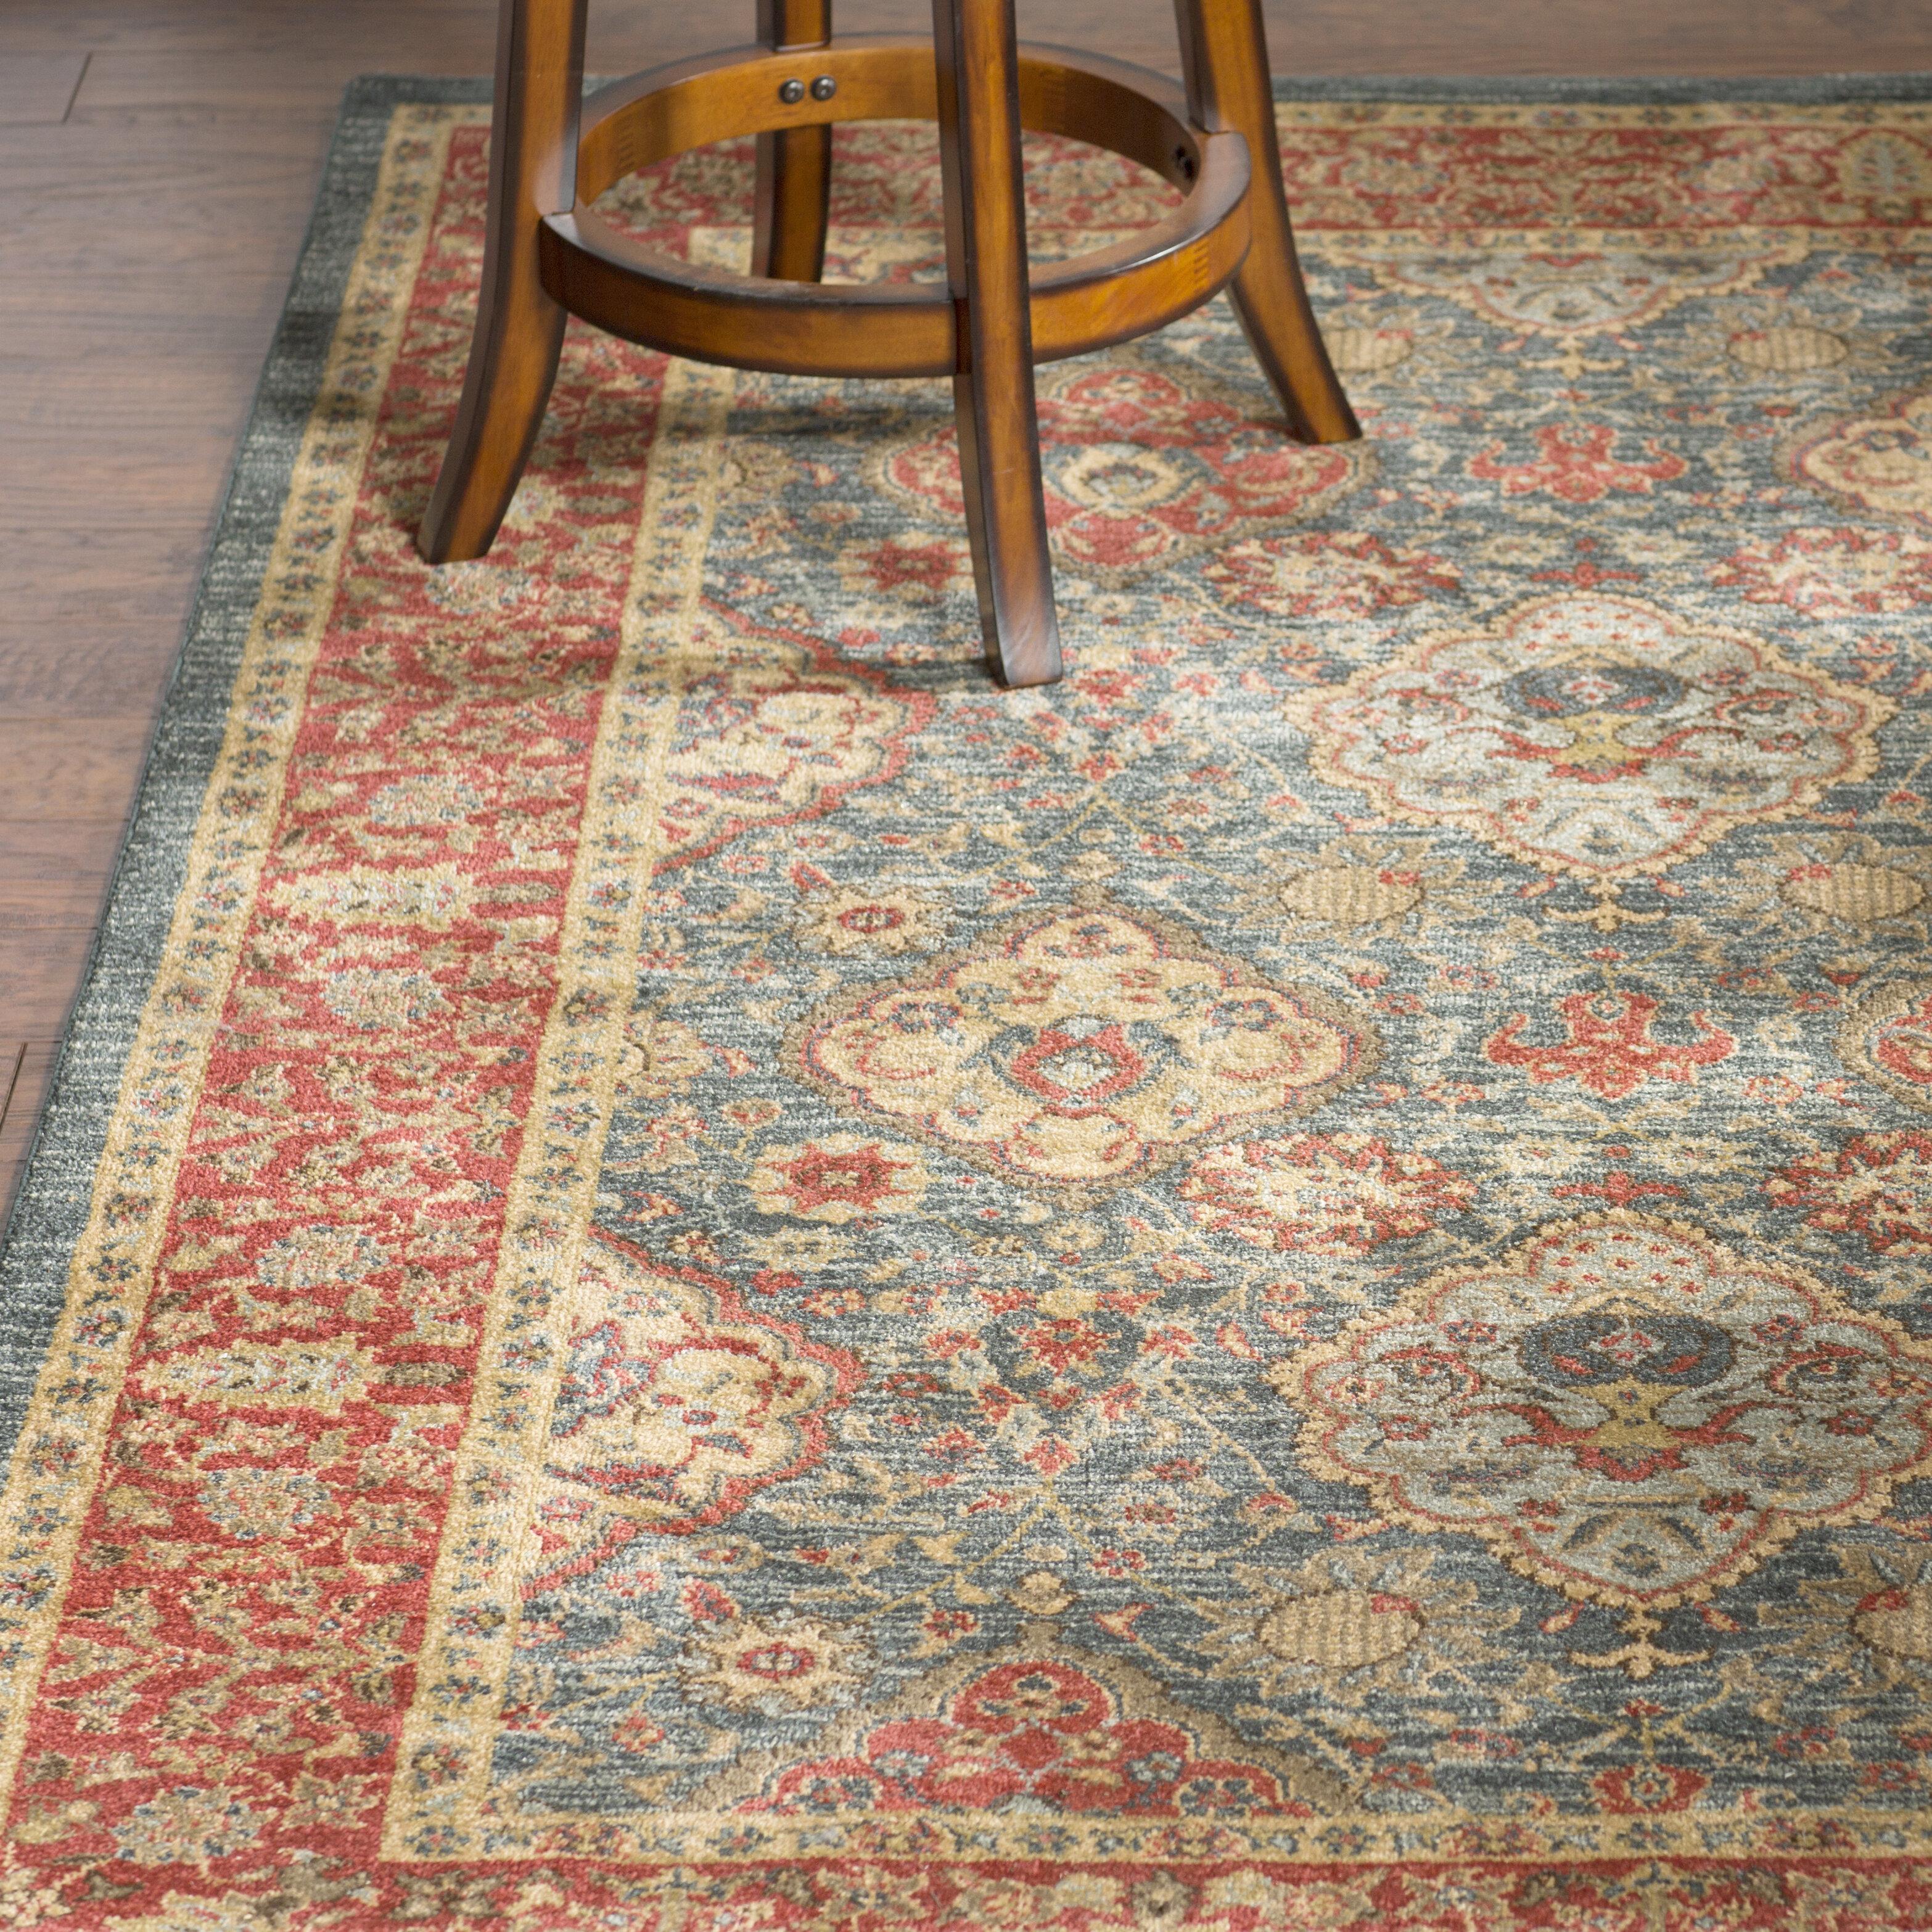 rug phoebe lane orange windows birch rugs hand area reviews burnt and main wool woven pdp joss